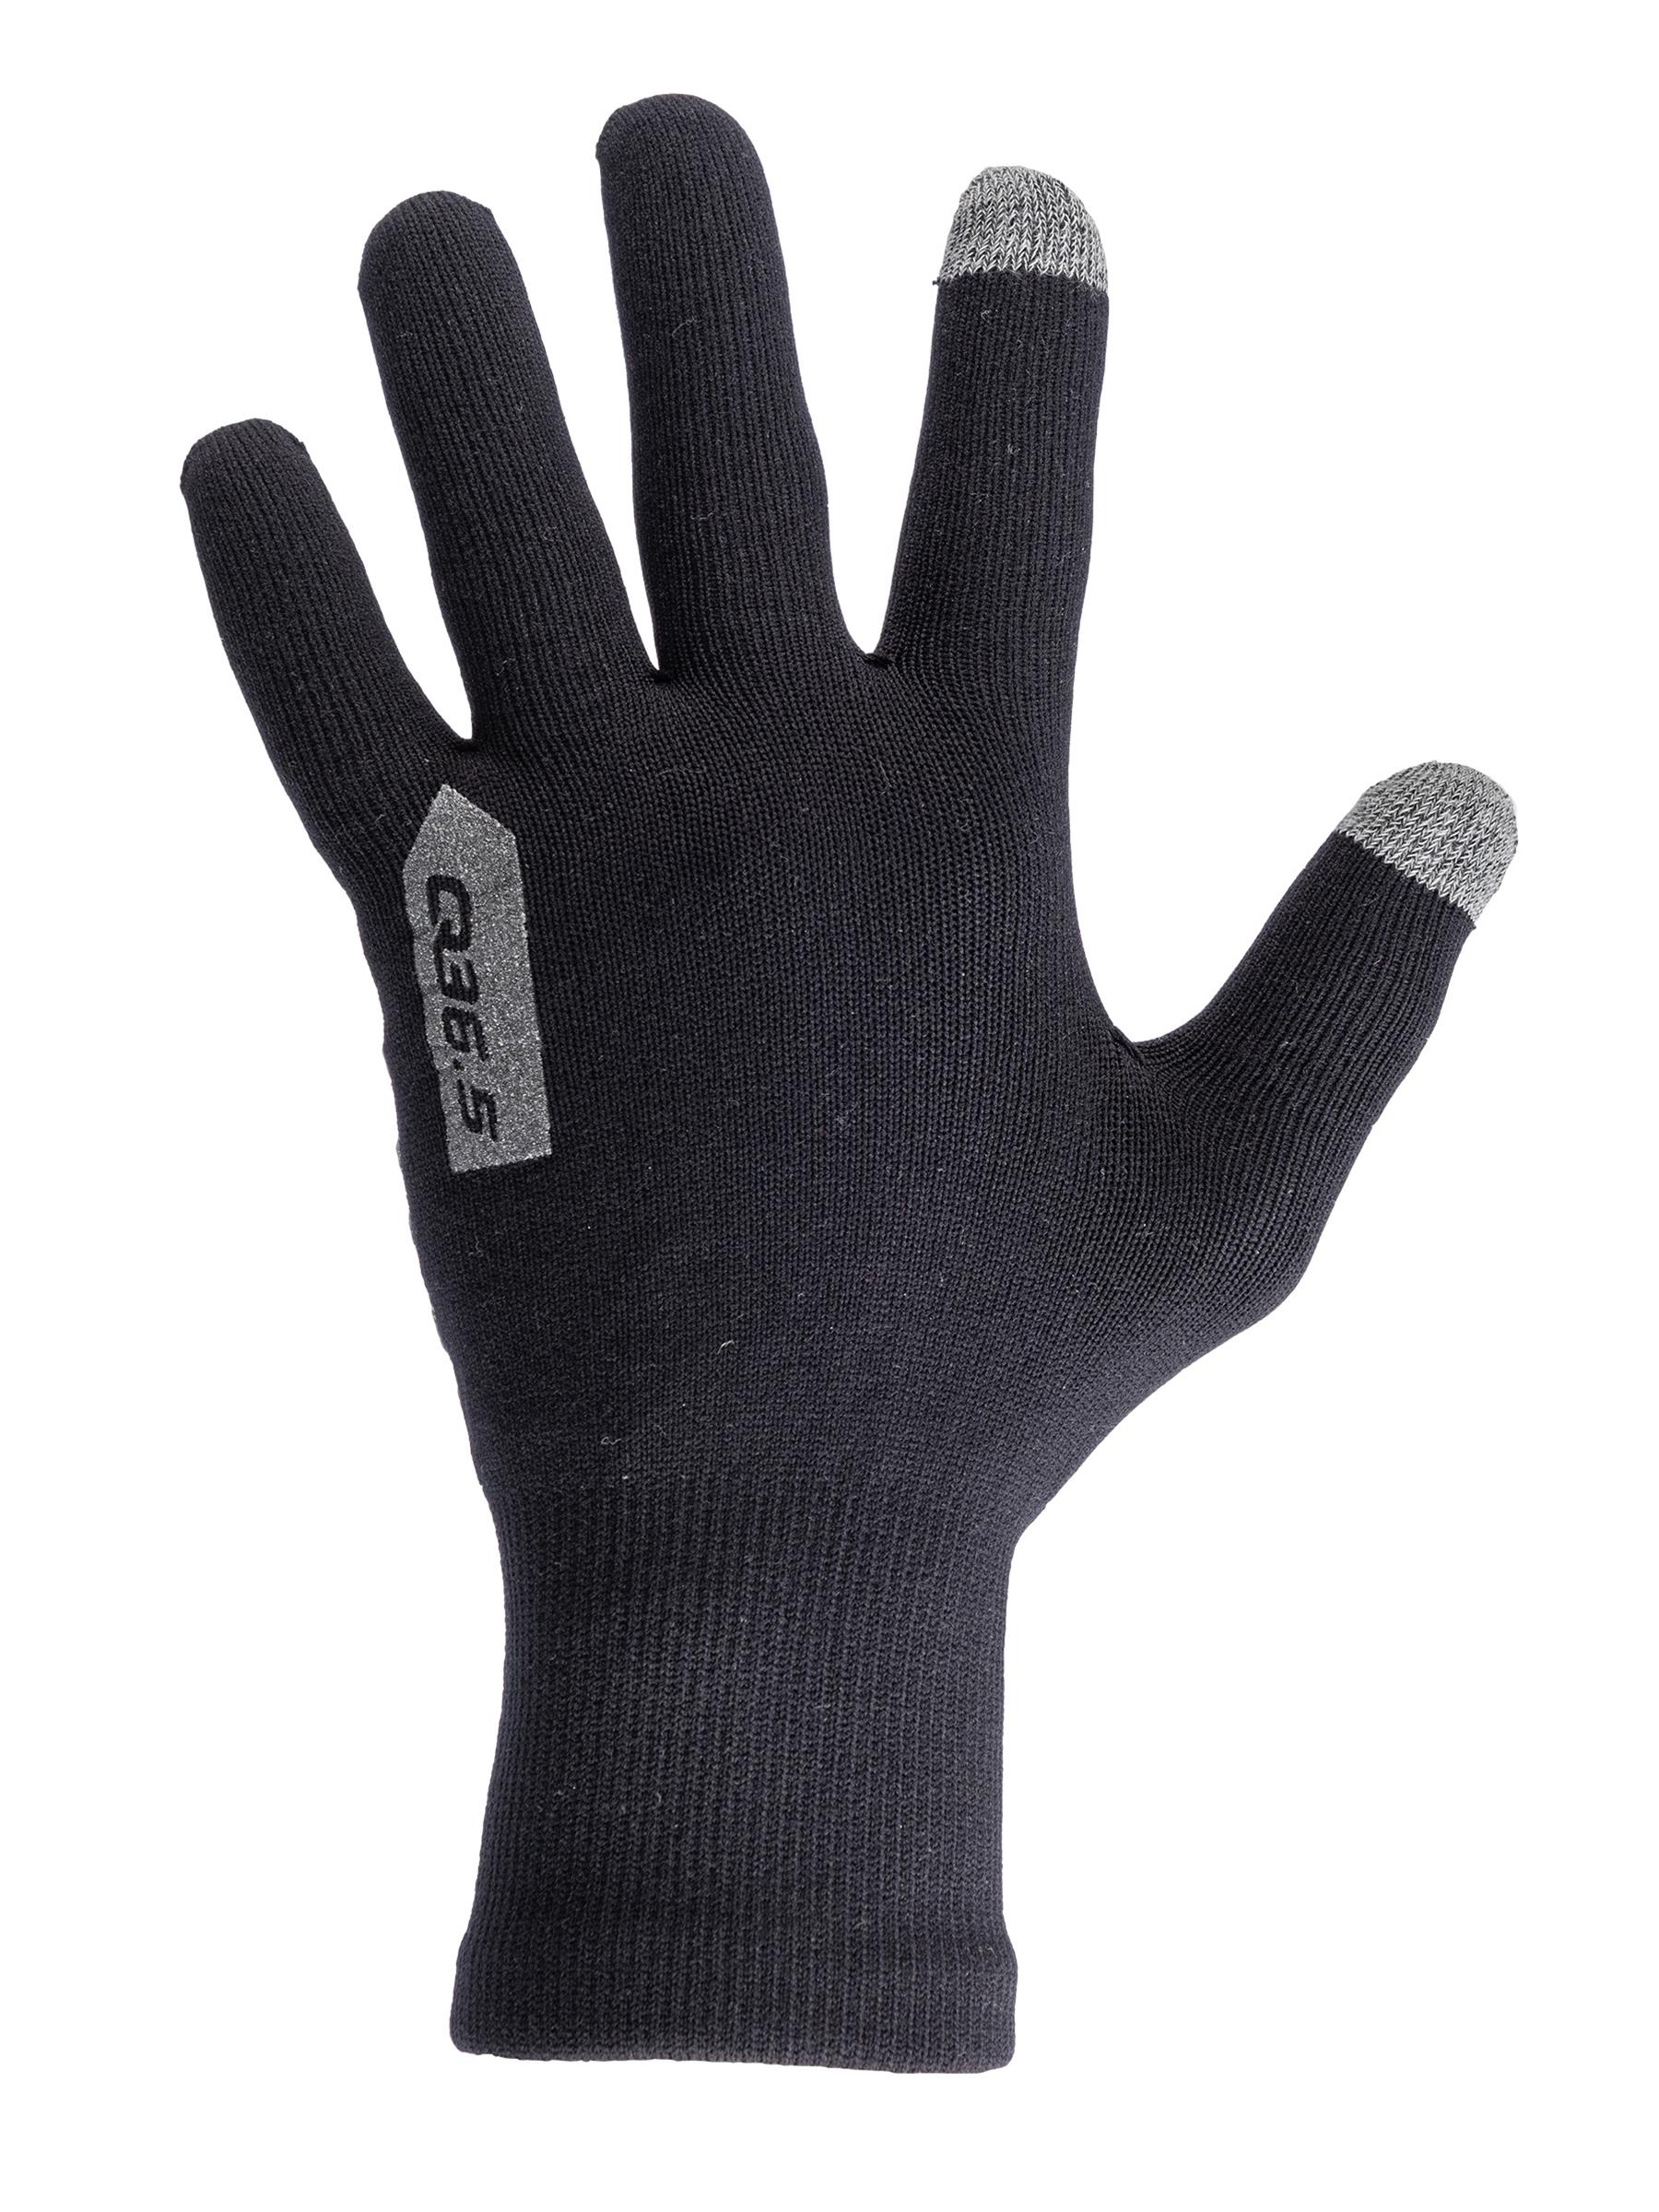 Cycling winter rain gloves Amphib Q36.5 - 4000X